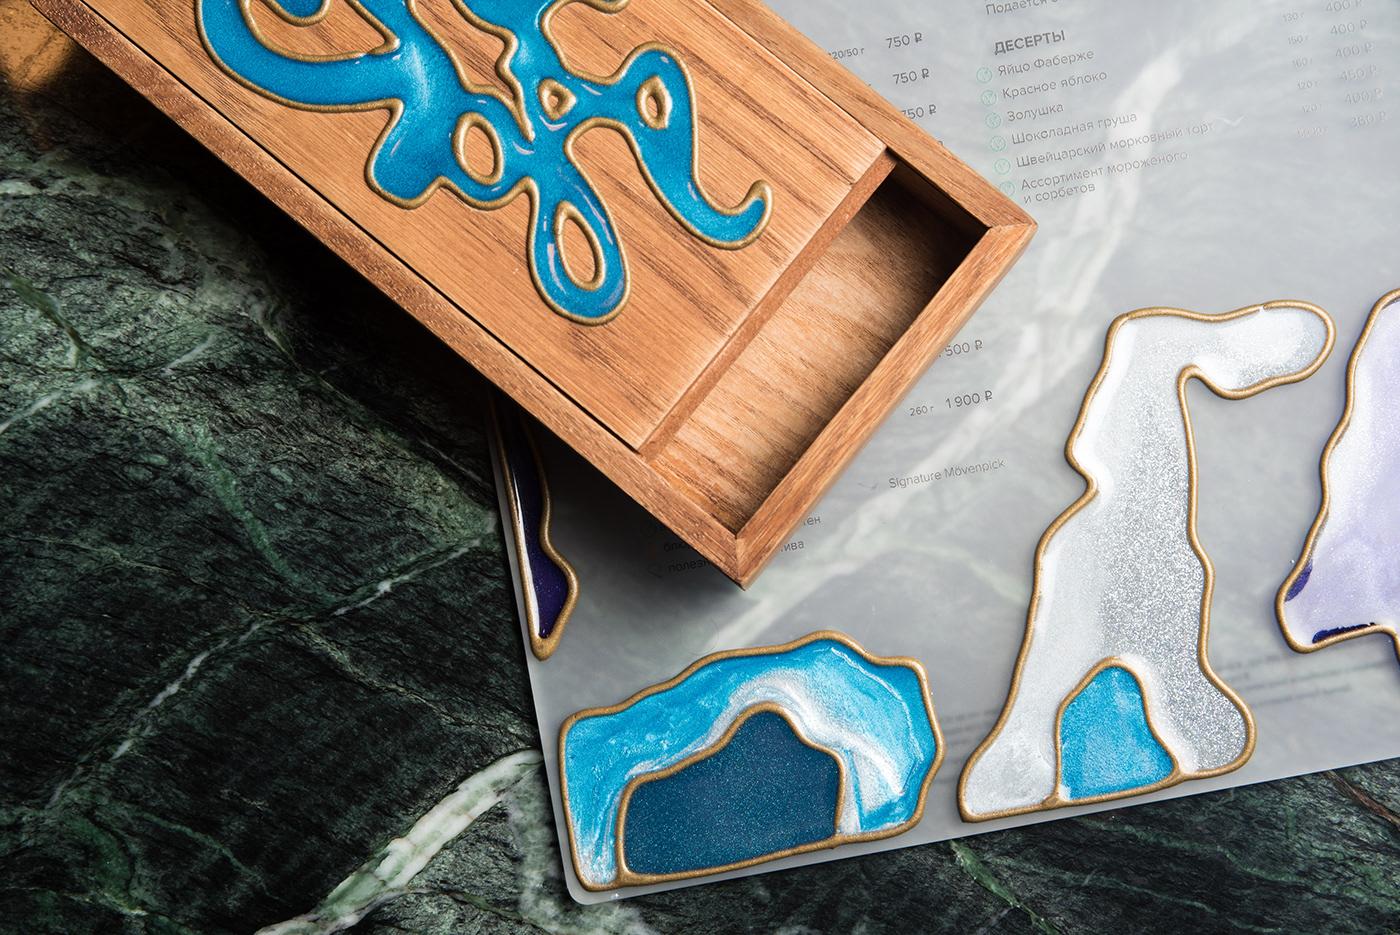 bar branding  chagal identity Logotype Mark Chagal menu restaurant shagal vitrage